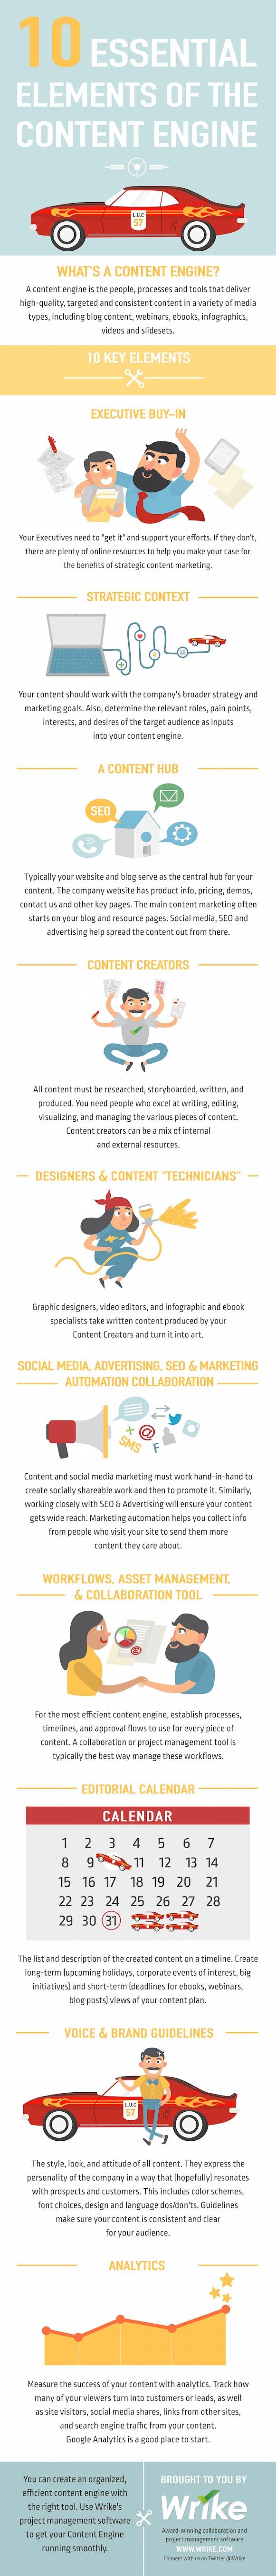 Successful Content Marketing Strategies